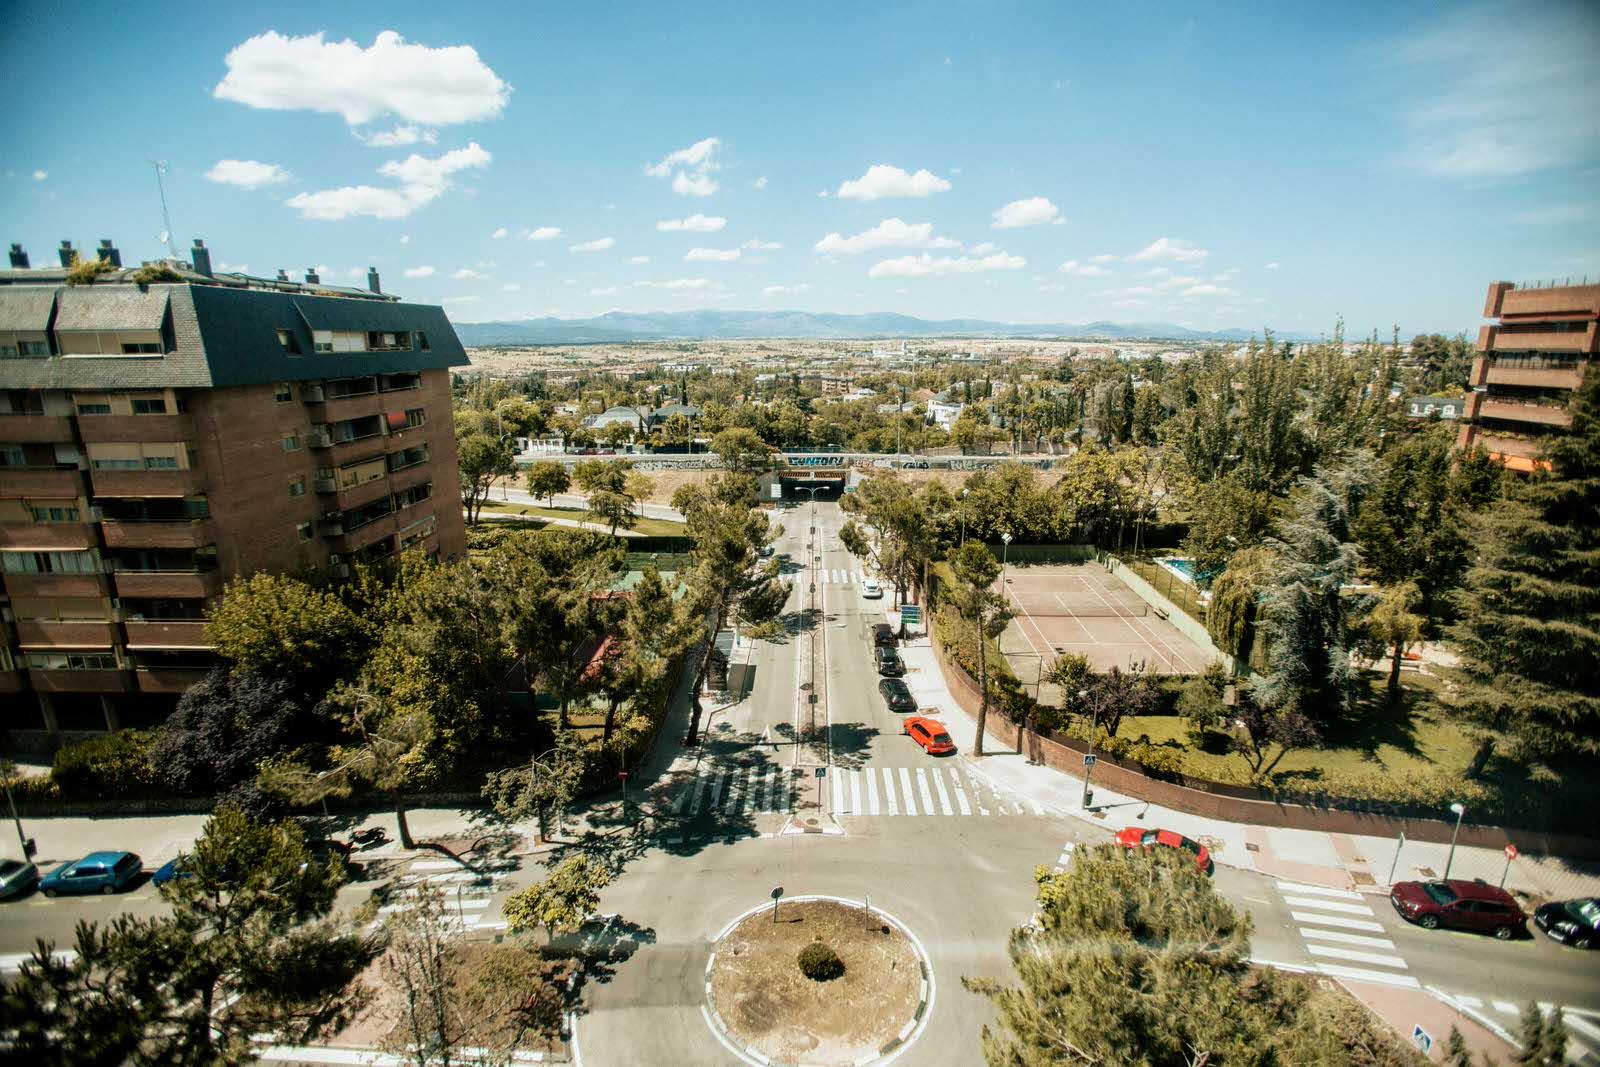 vista desde el Hotel Eurostar Suites Mirasierra